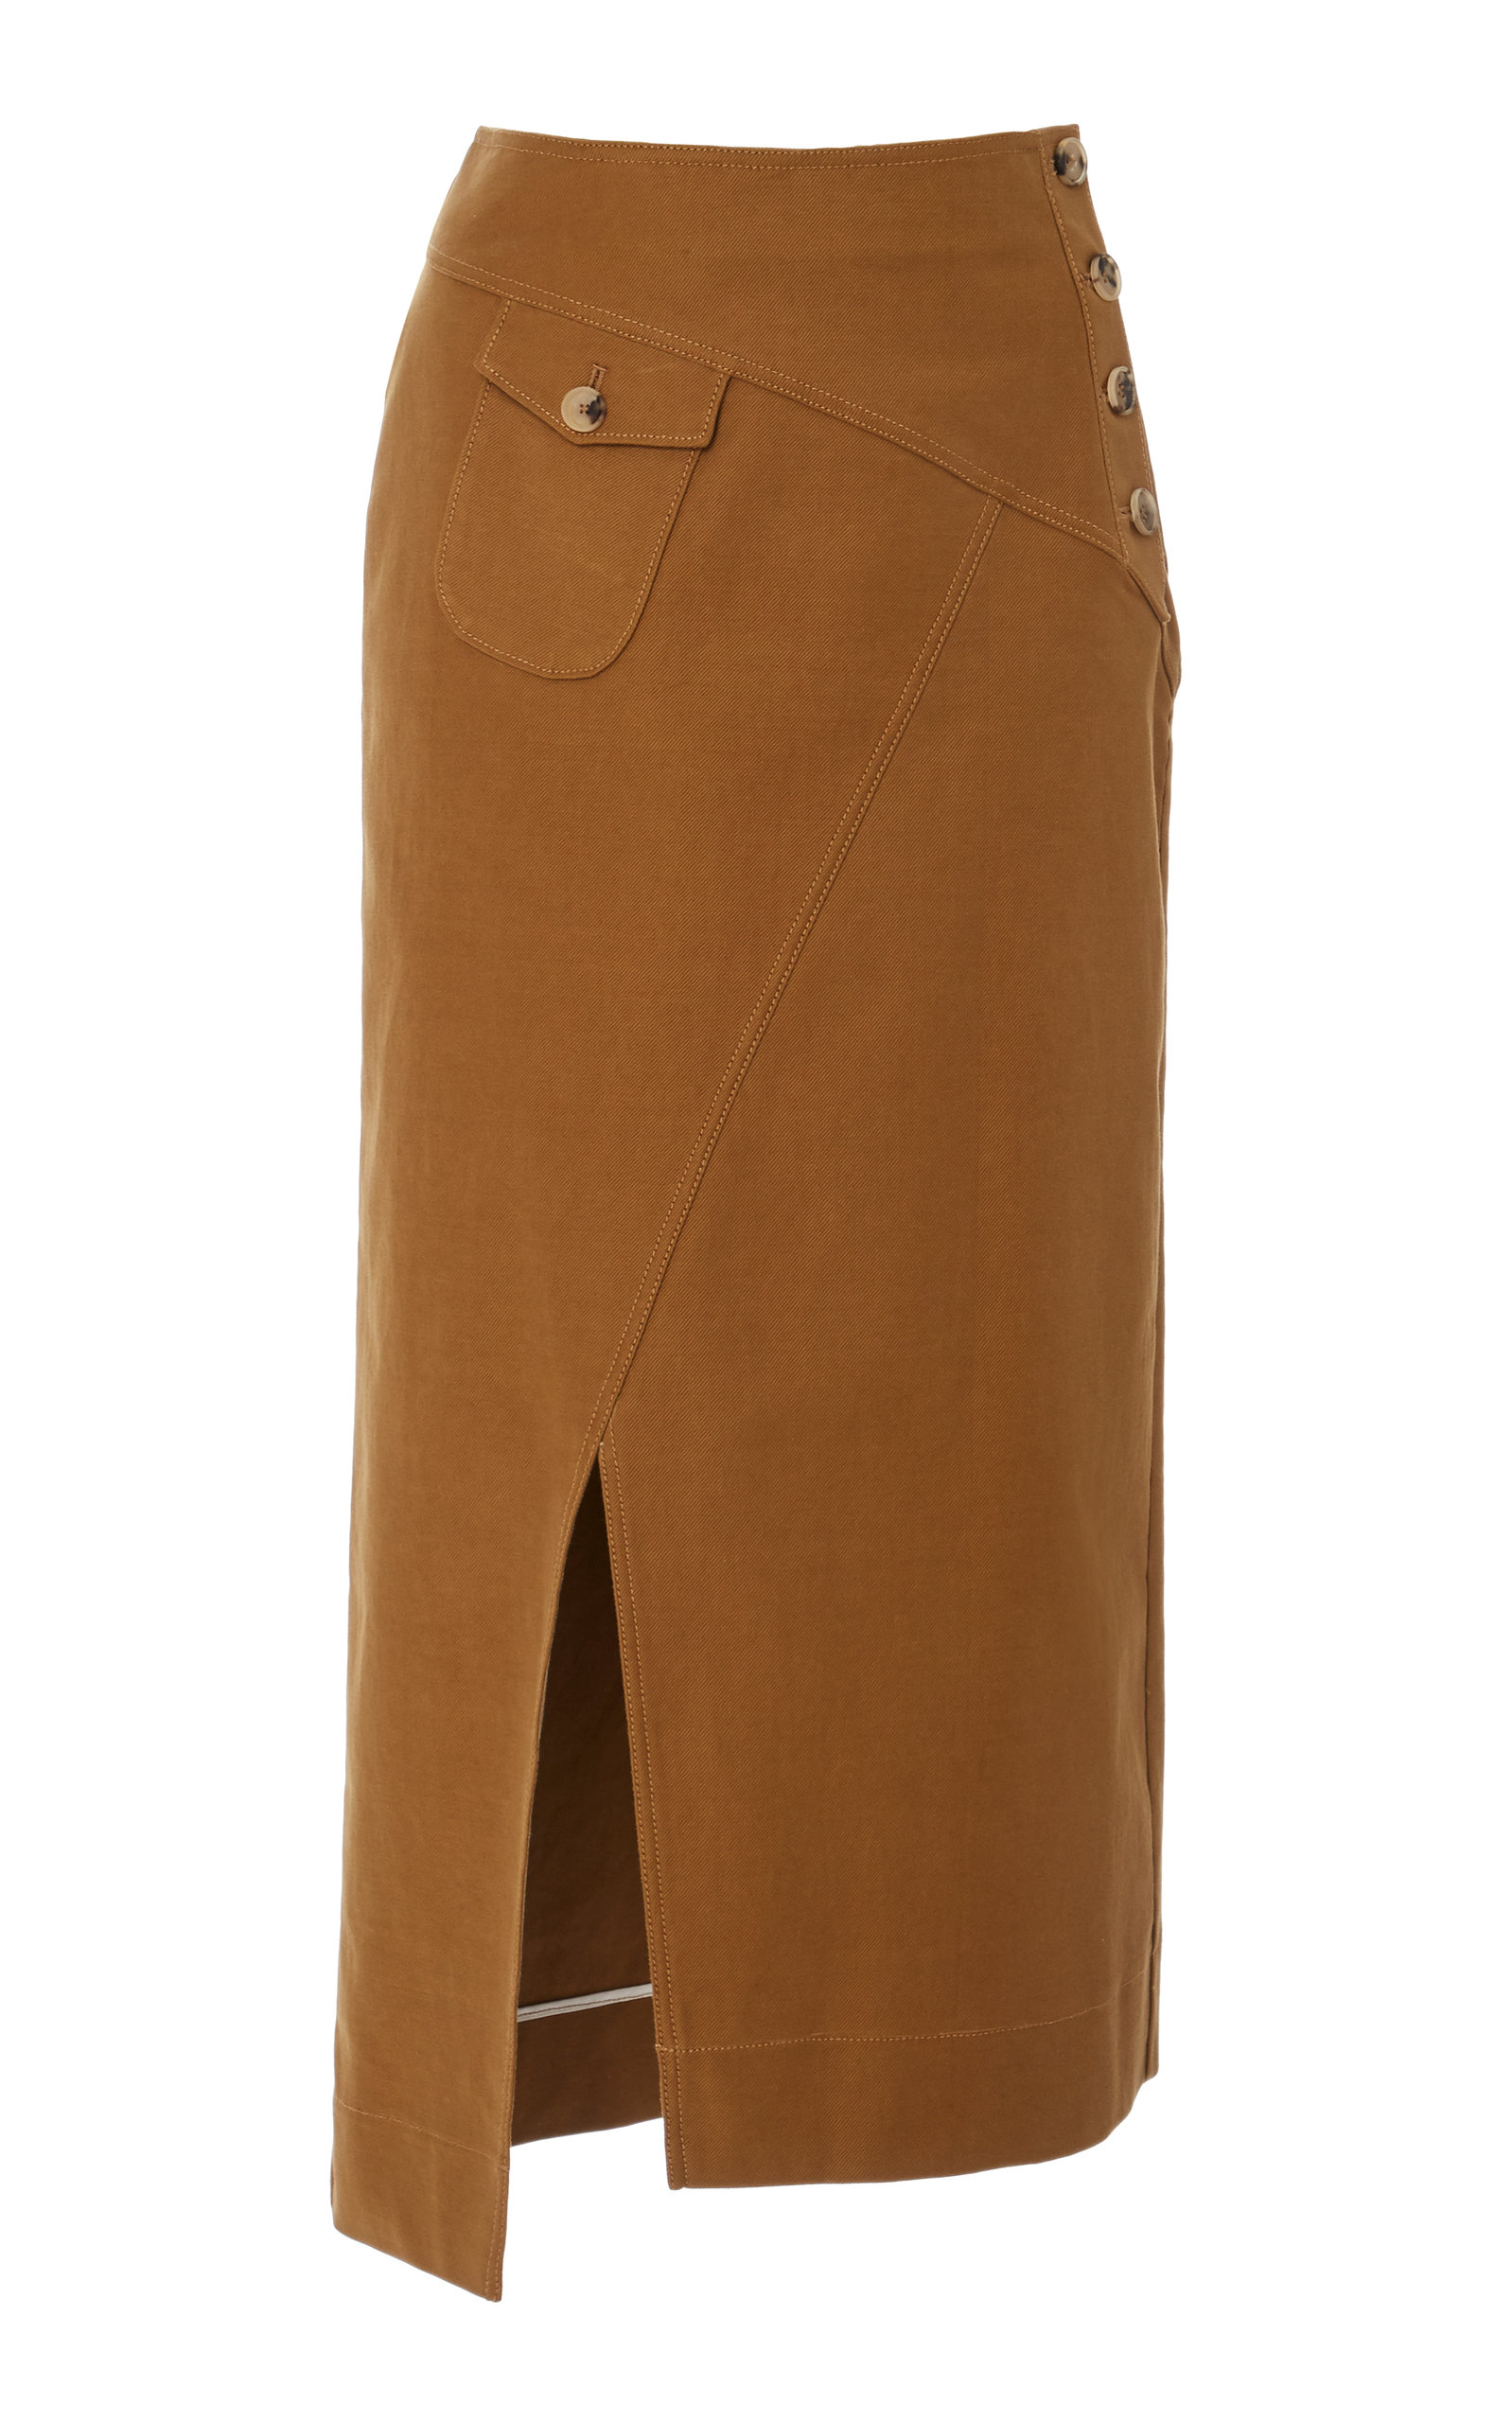 9052c4812e01 Shop Rejina Pyo Skirts for Women | ModeSens